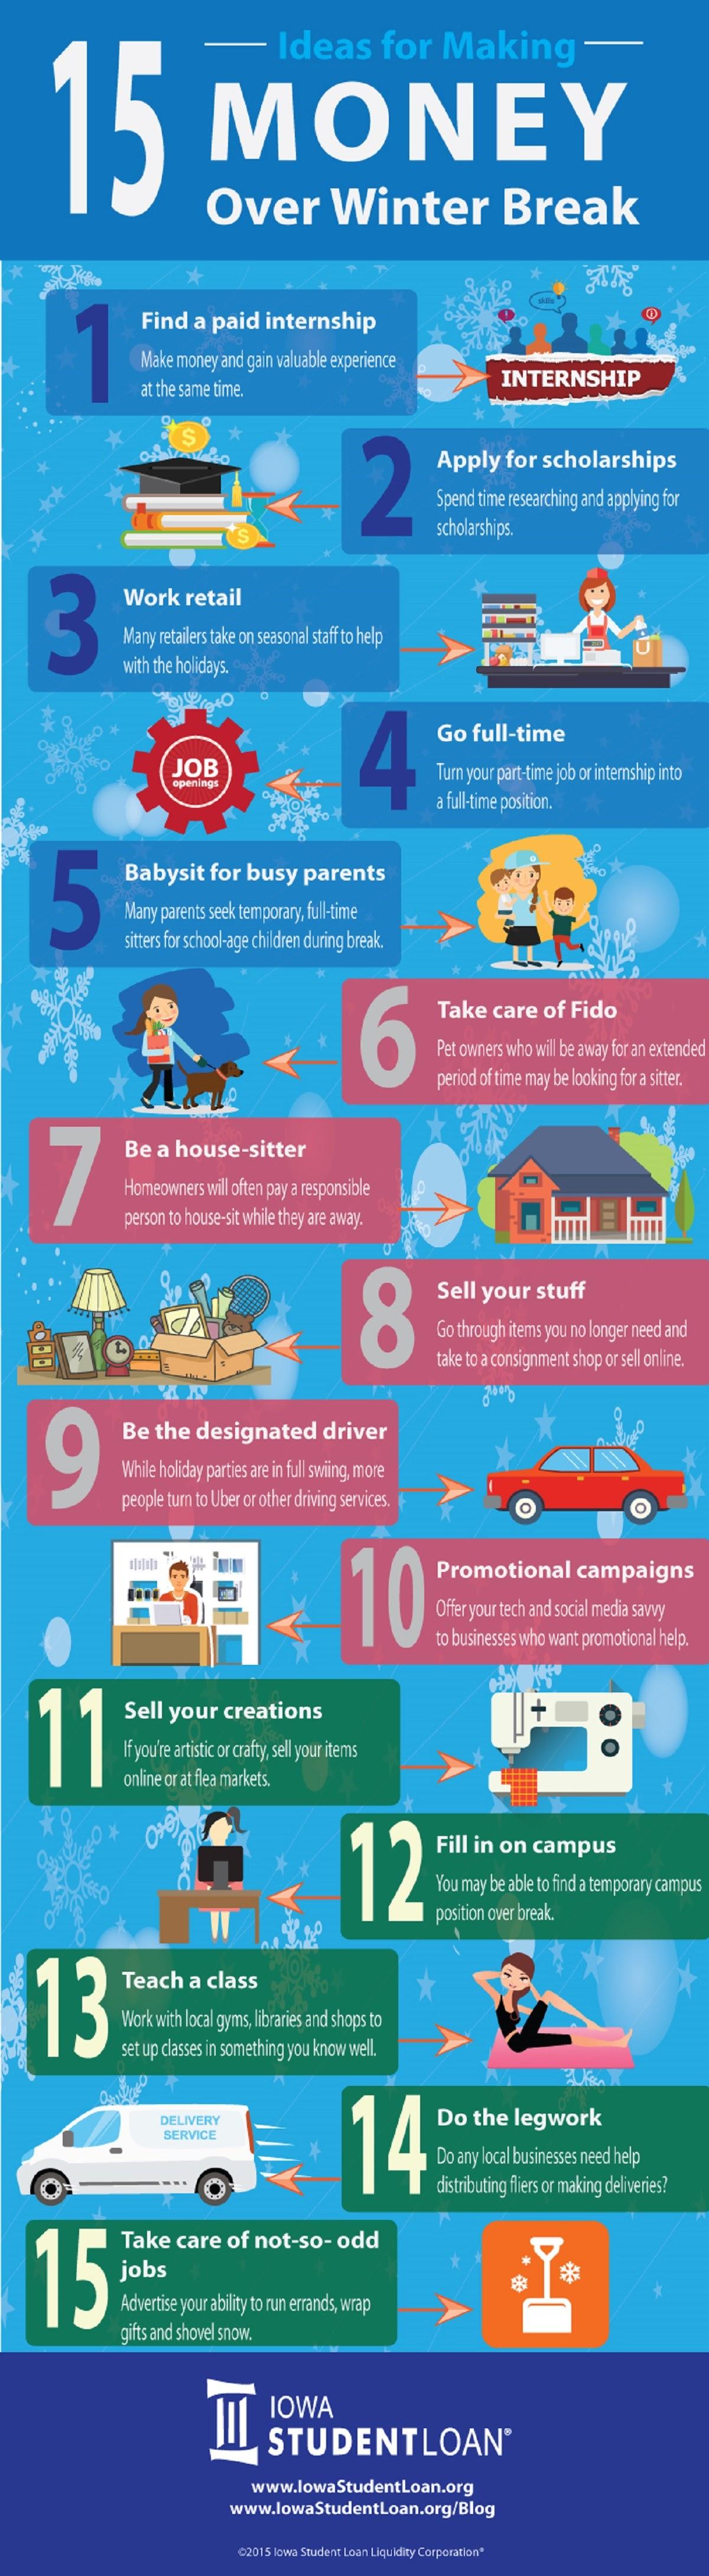 15-ideas-for-making-money-during-winter-break-infographic